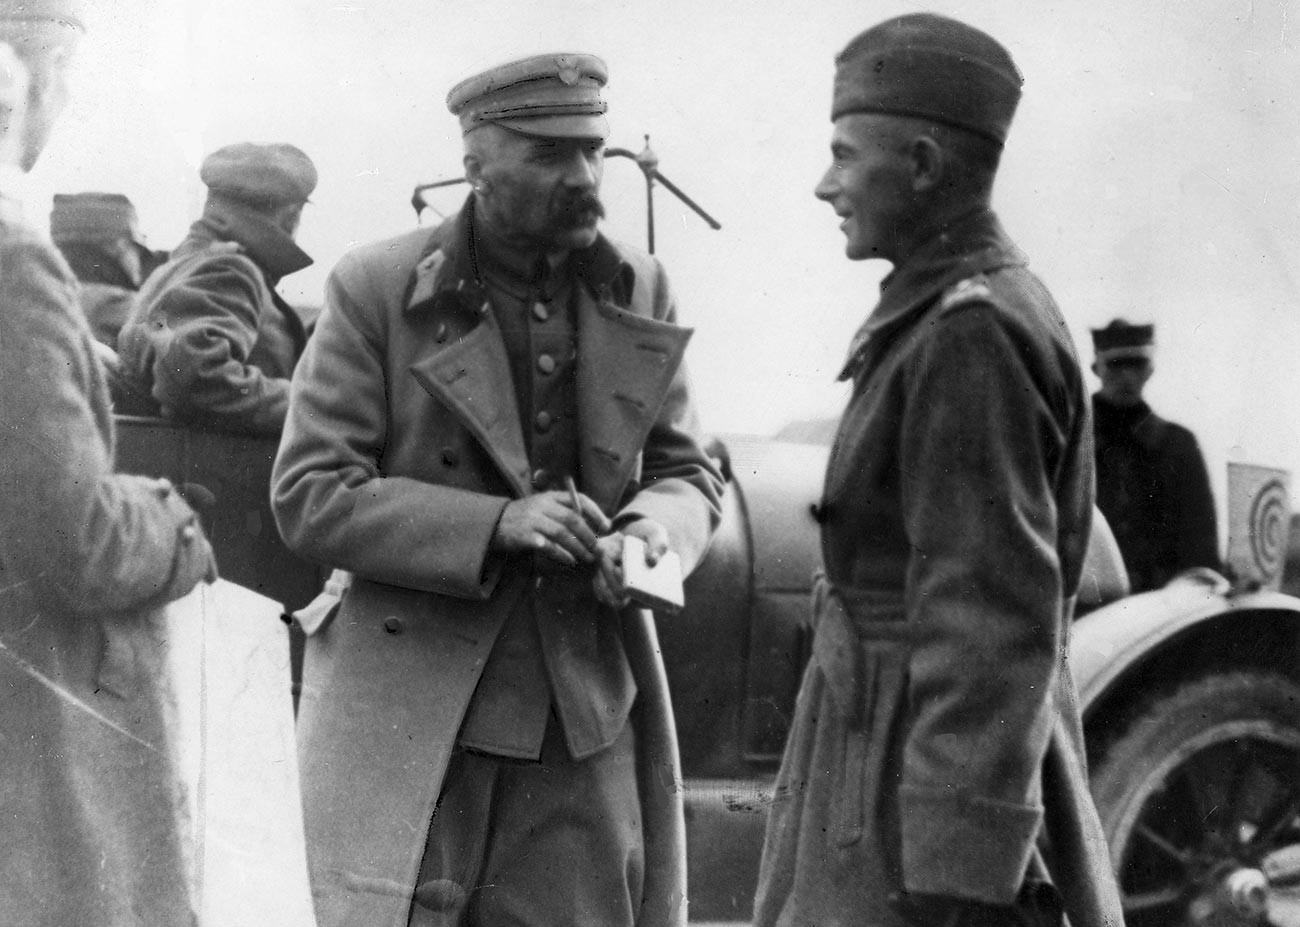 Józef Piłsudski et Rydz-Śmigły